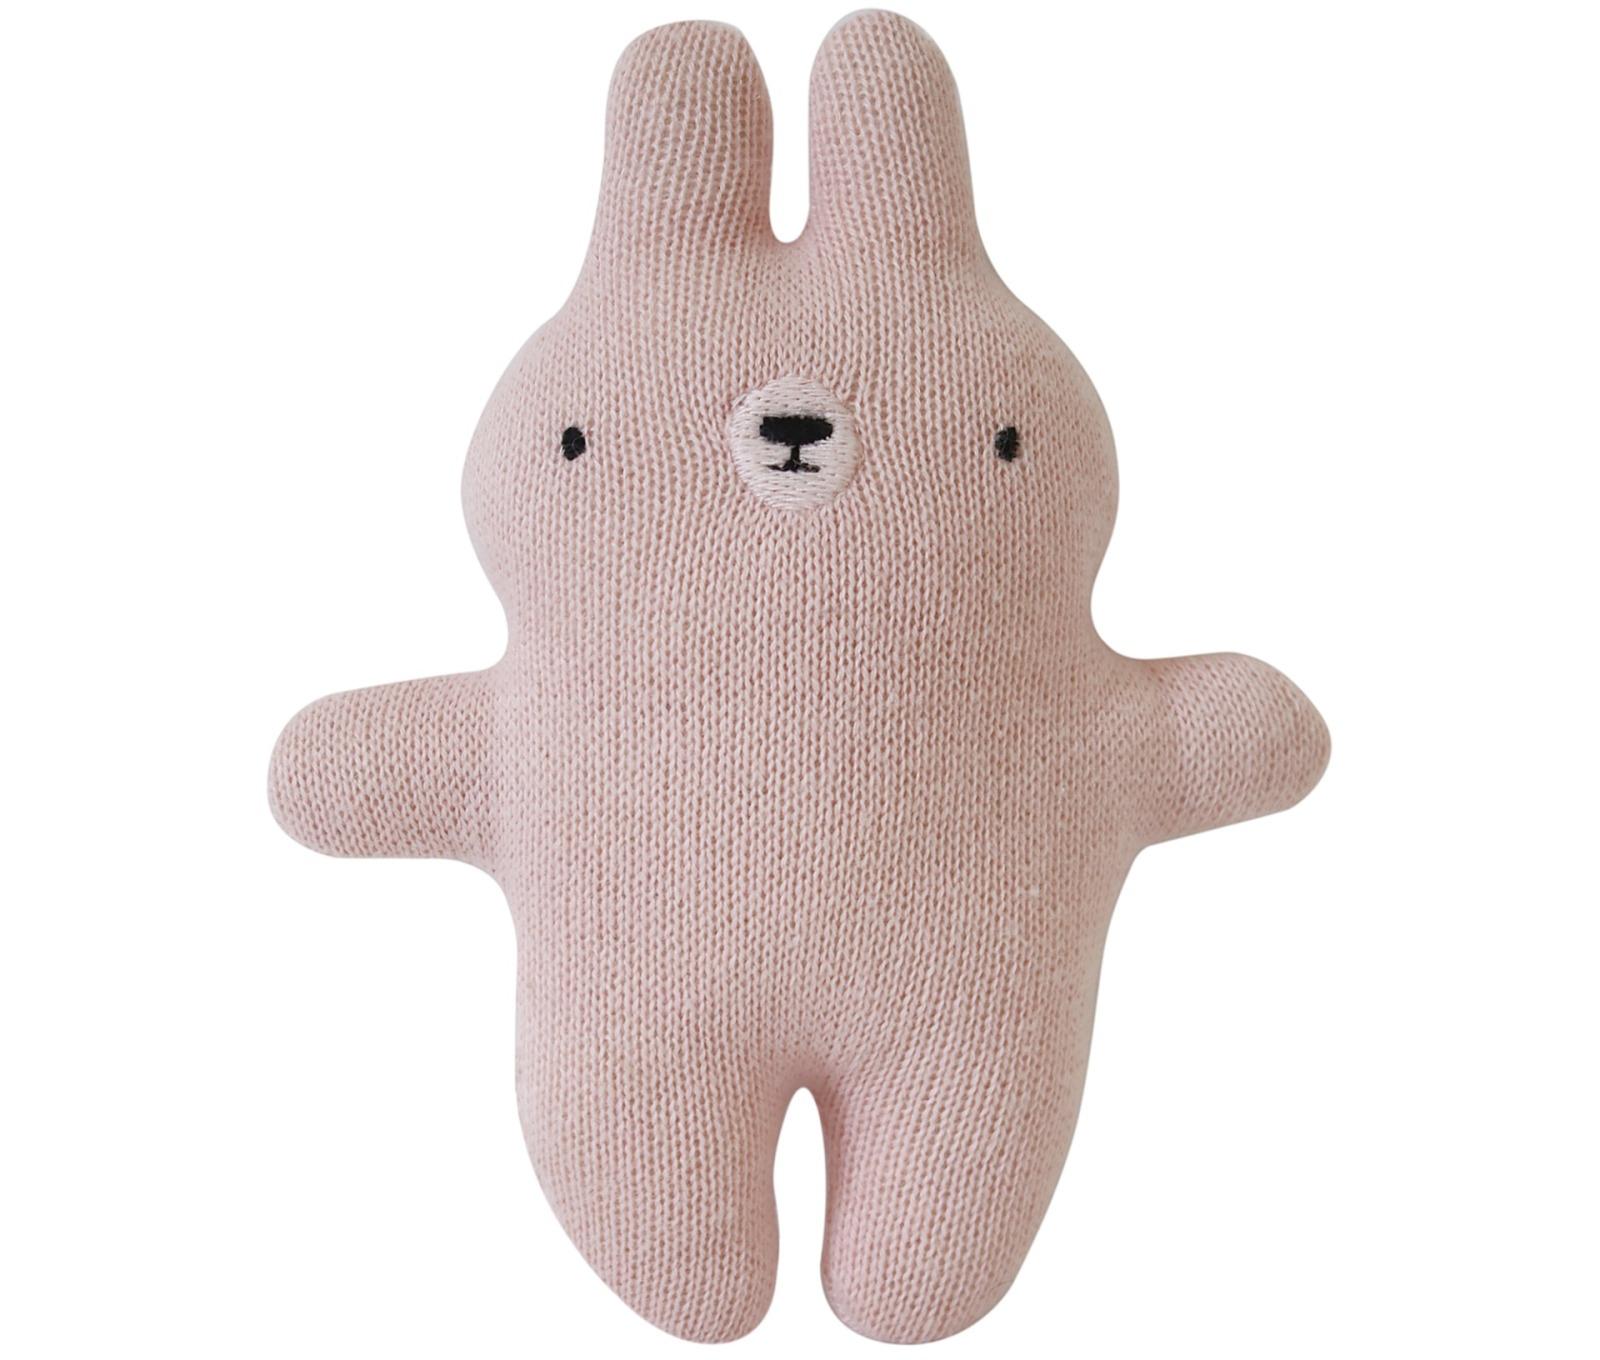 Eef Lillemor Plush Rattle Bunny